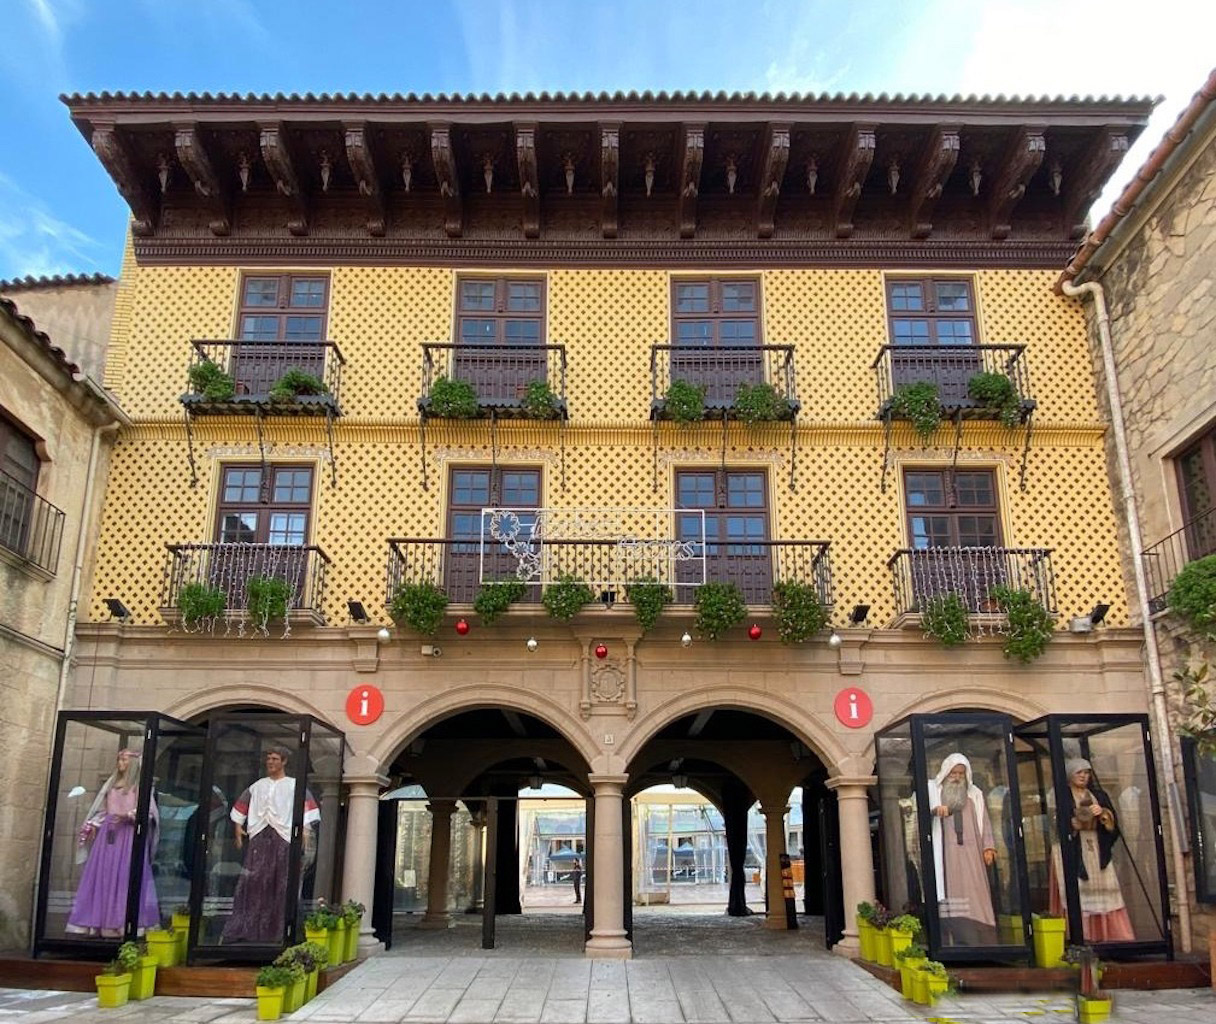 Музей - Испанская деревня в Барселоне